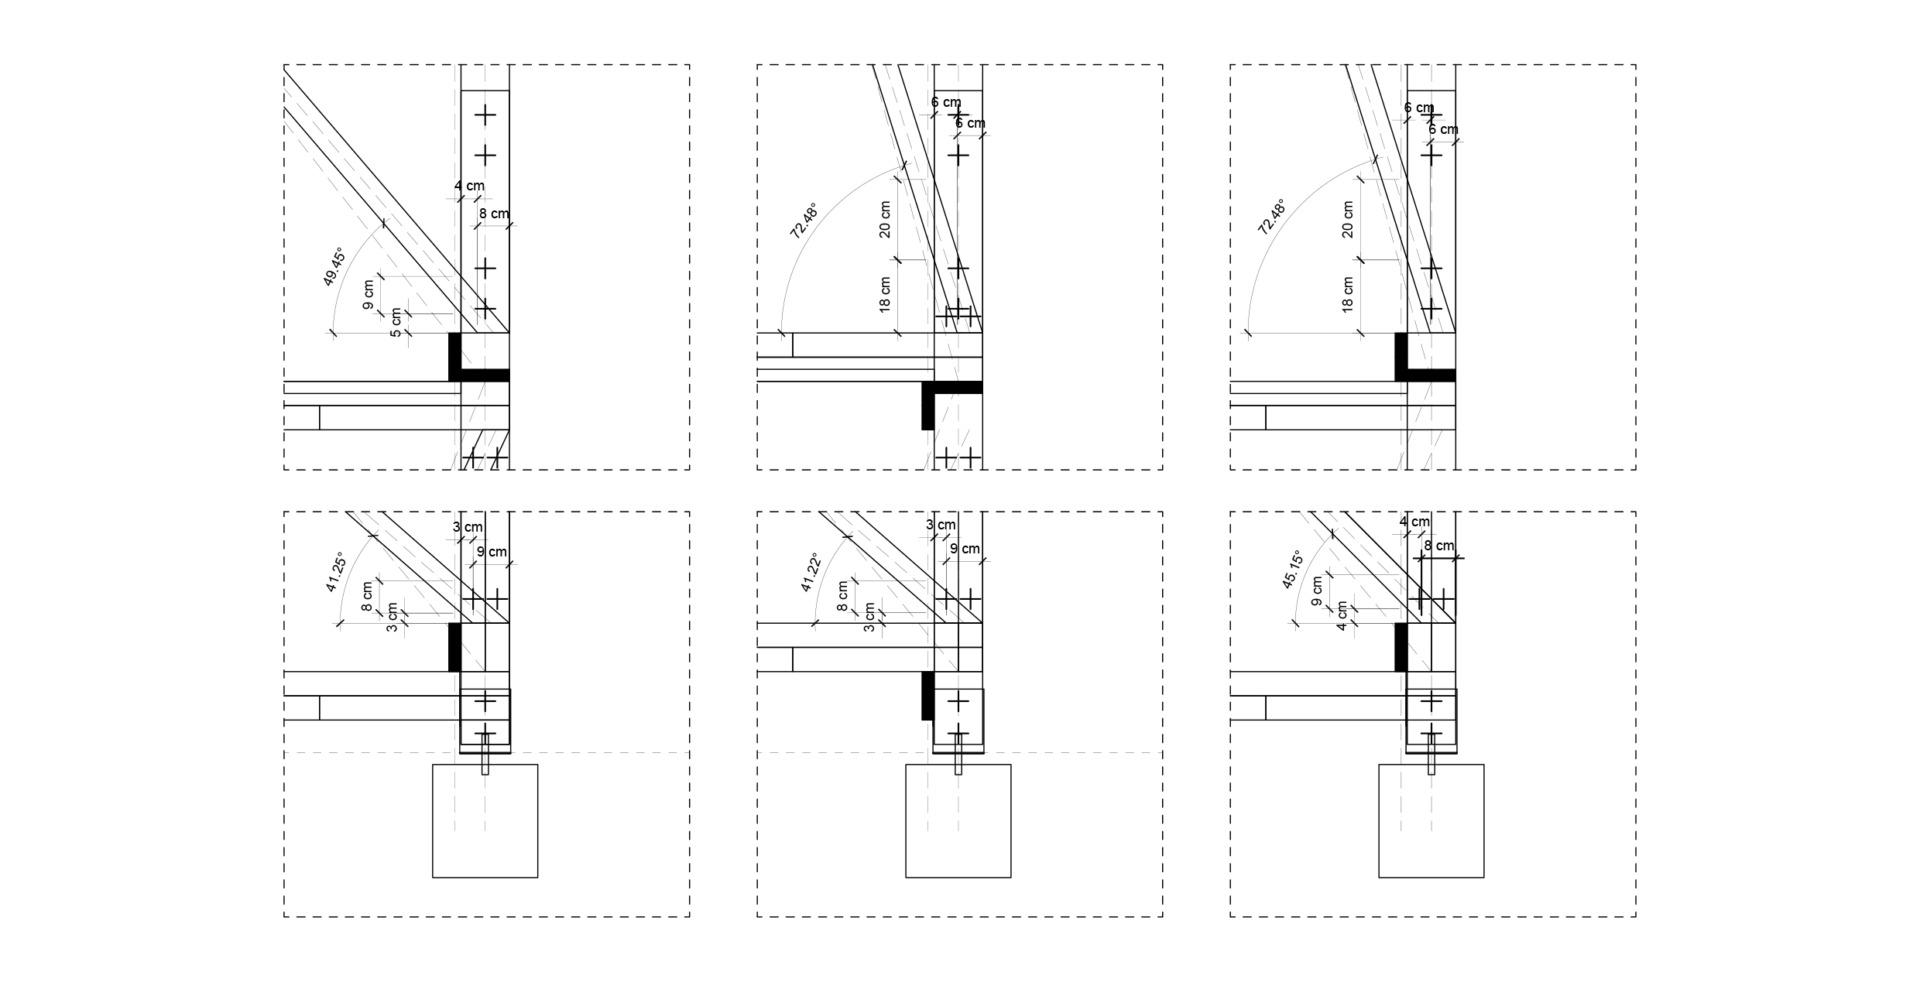 Sala Ferusic Architects Space 8 Carles Sala Relja Ferusic